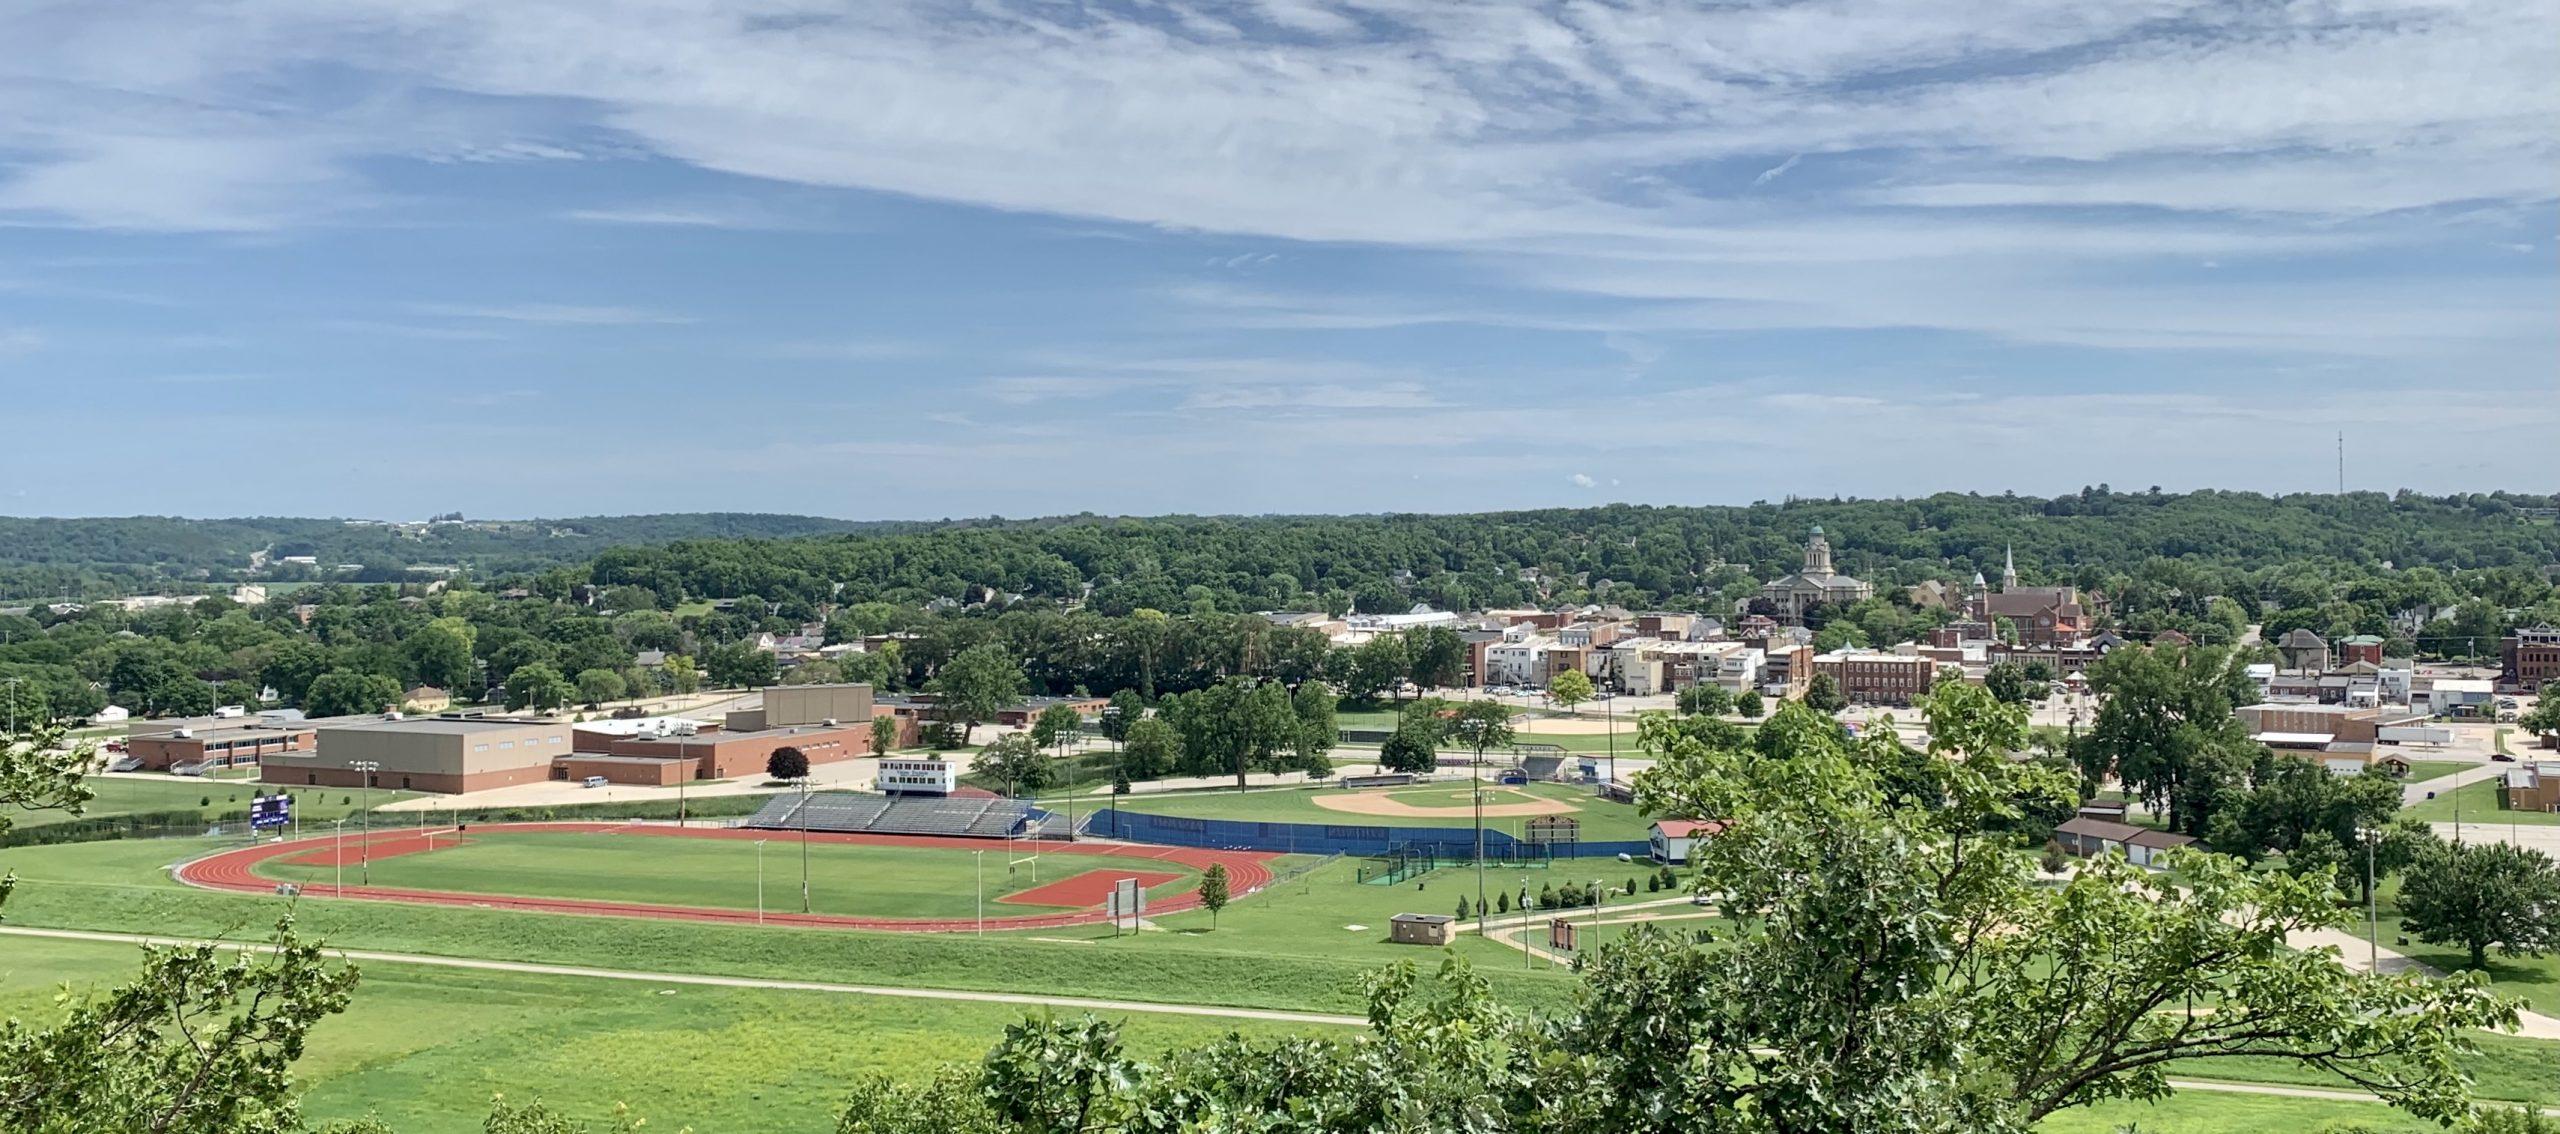 Overlooking Decorah, Iowa